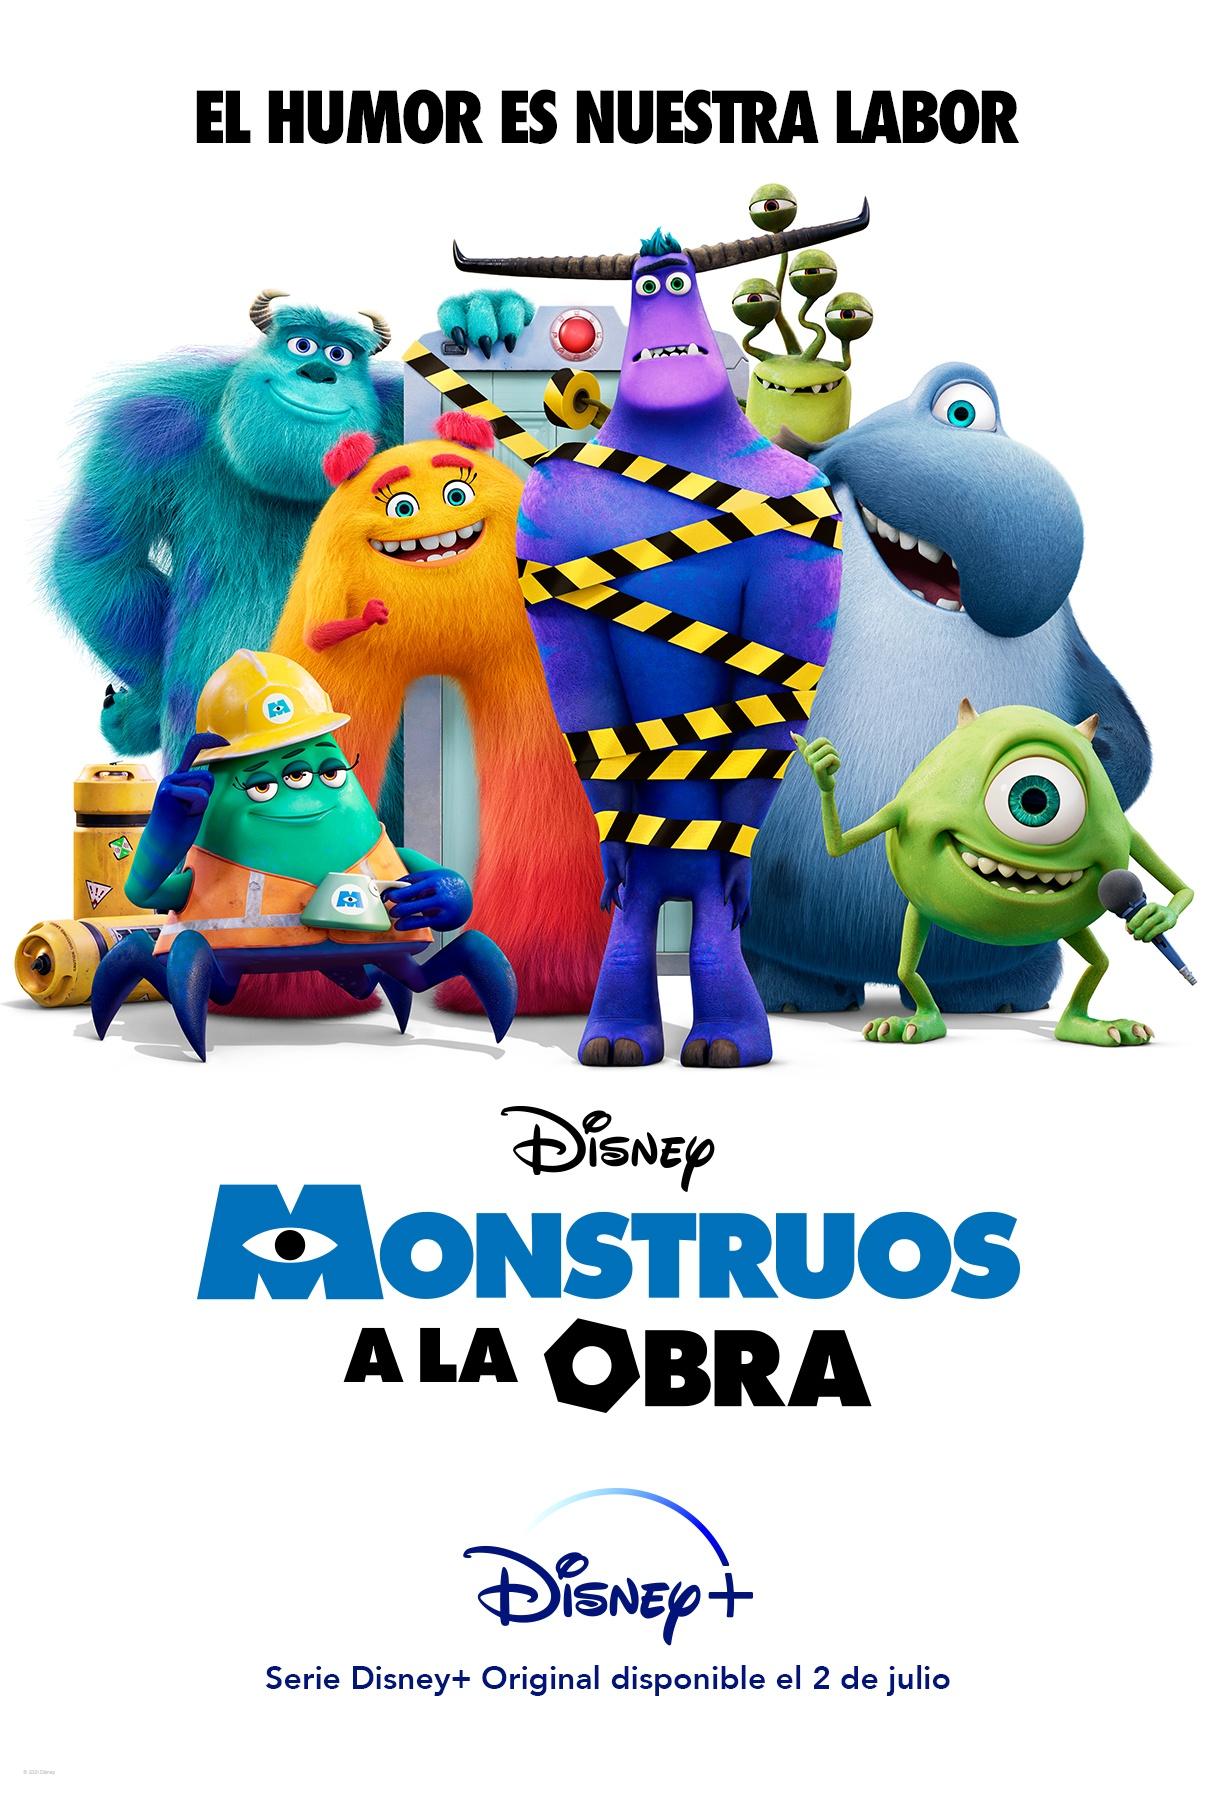 'Monstruos a la obra': Teaser de la serie original de Pixar • En tu pantalla